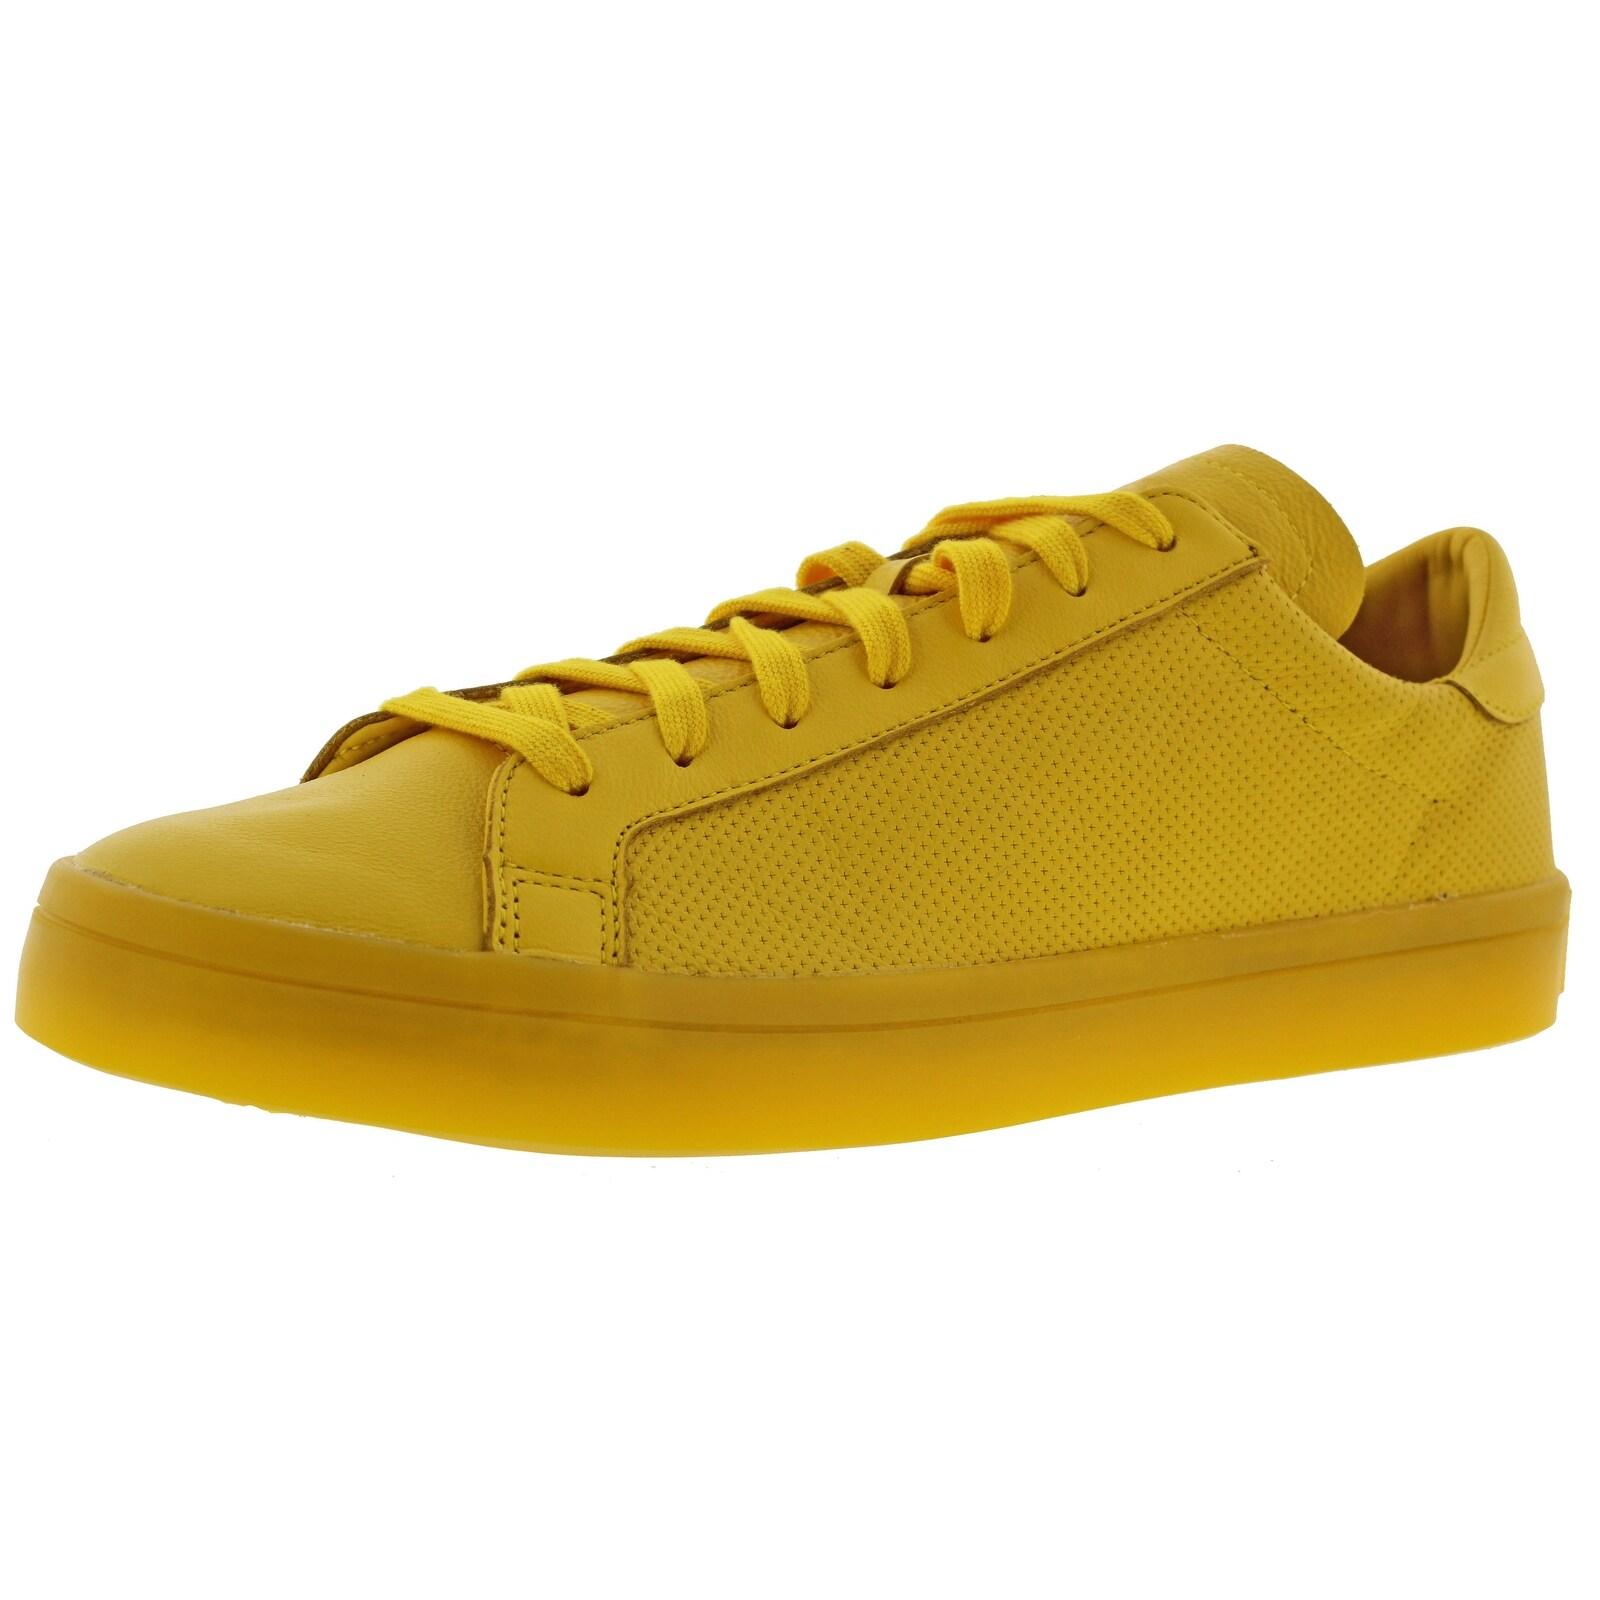 shop adidas originals gericht vantage - männer sneakers, schuhe